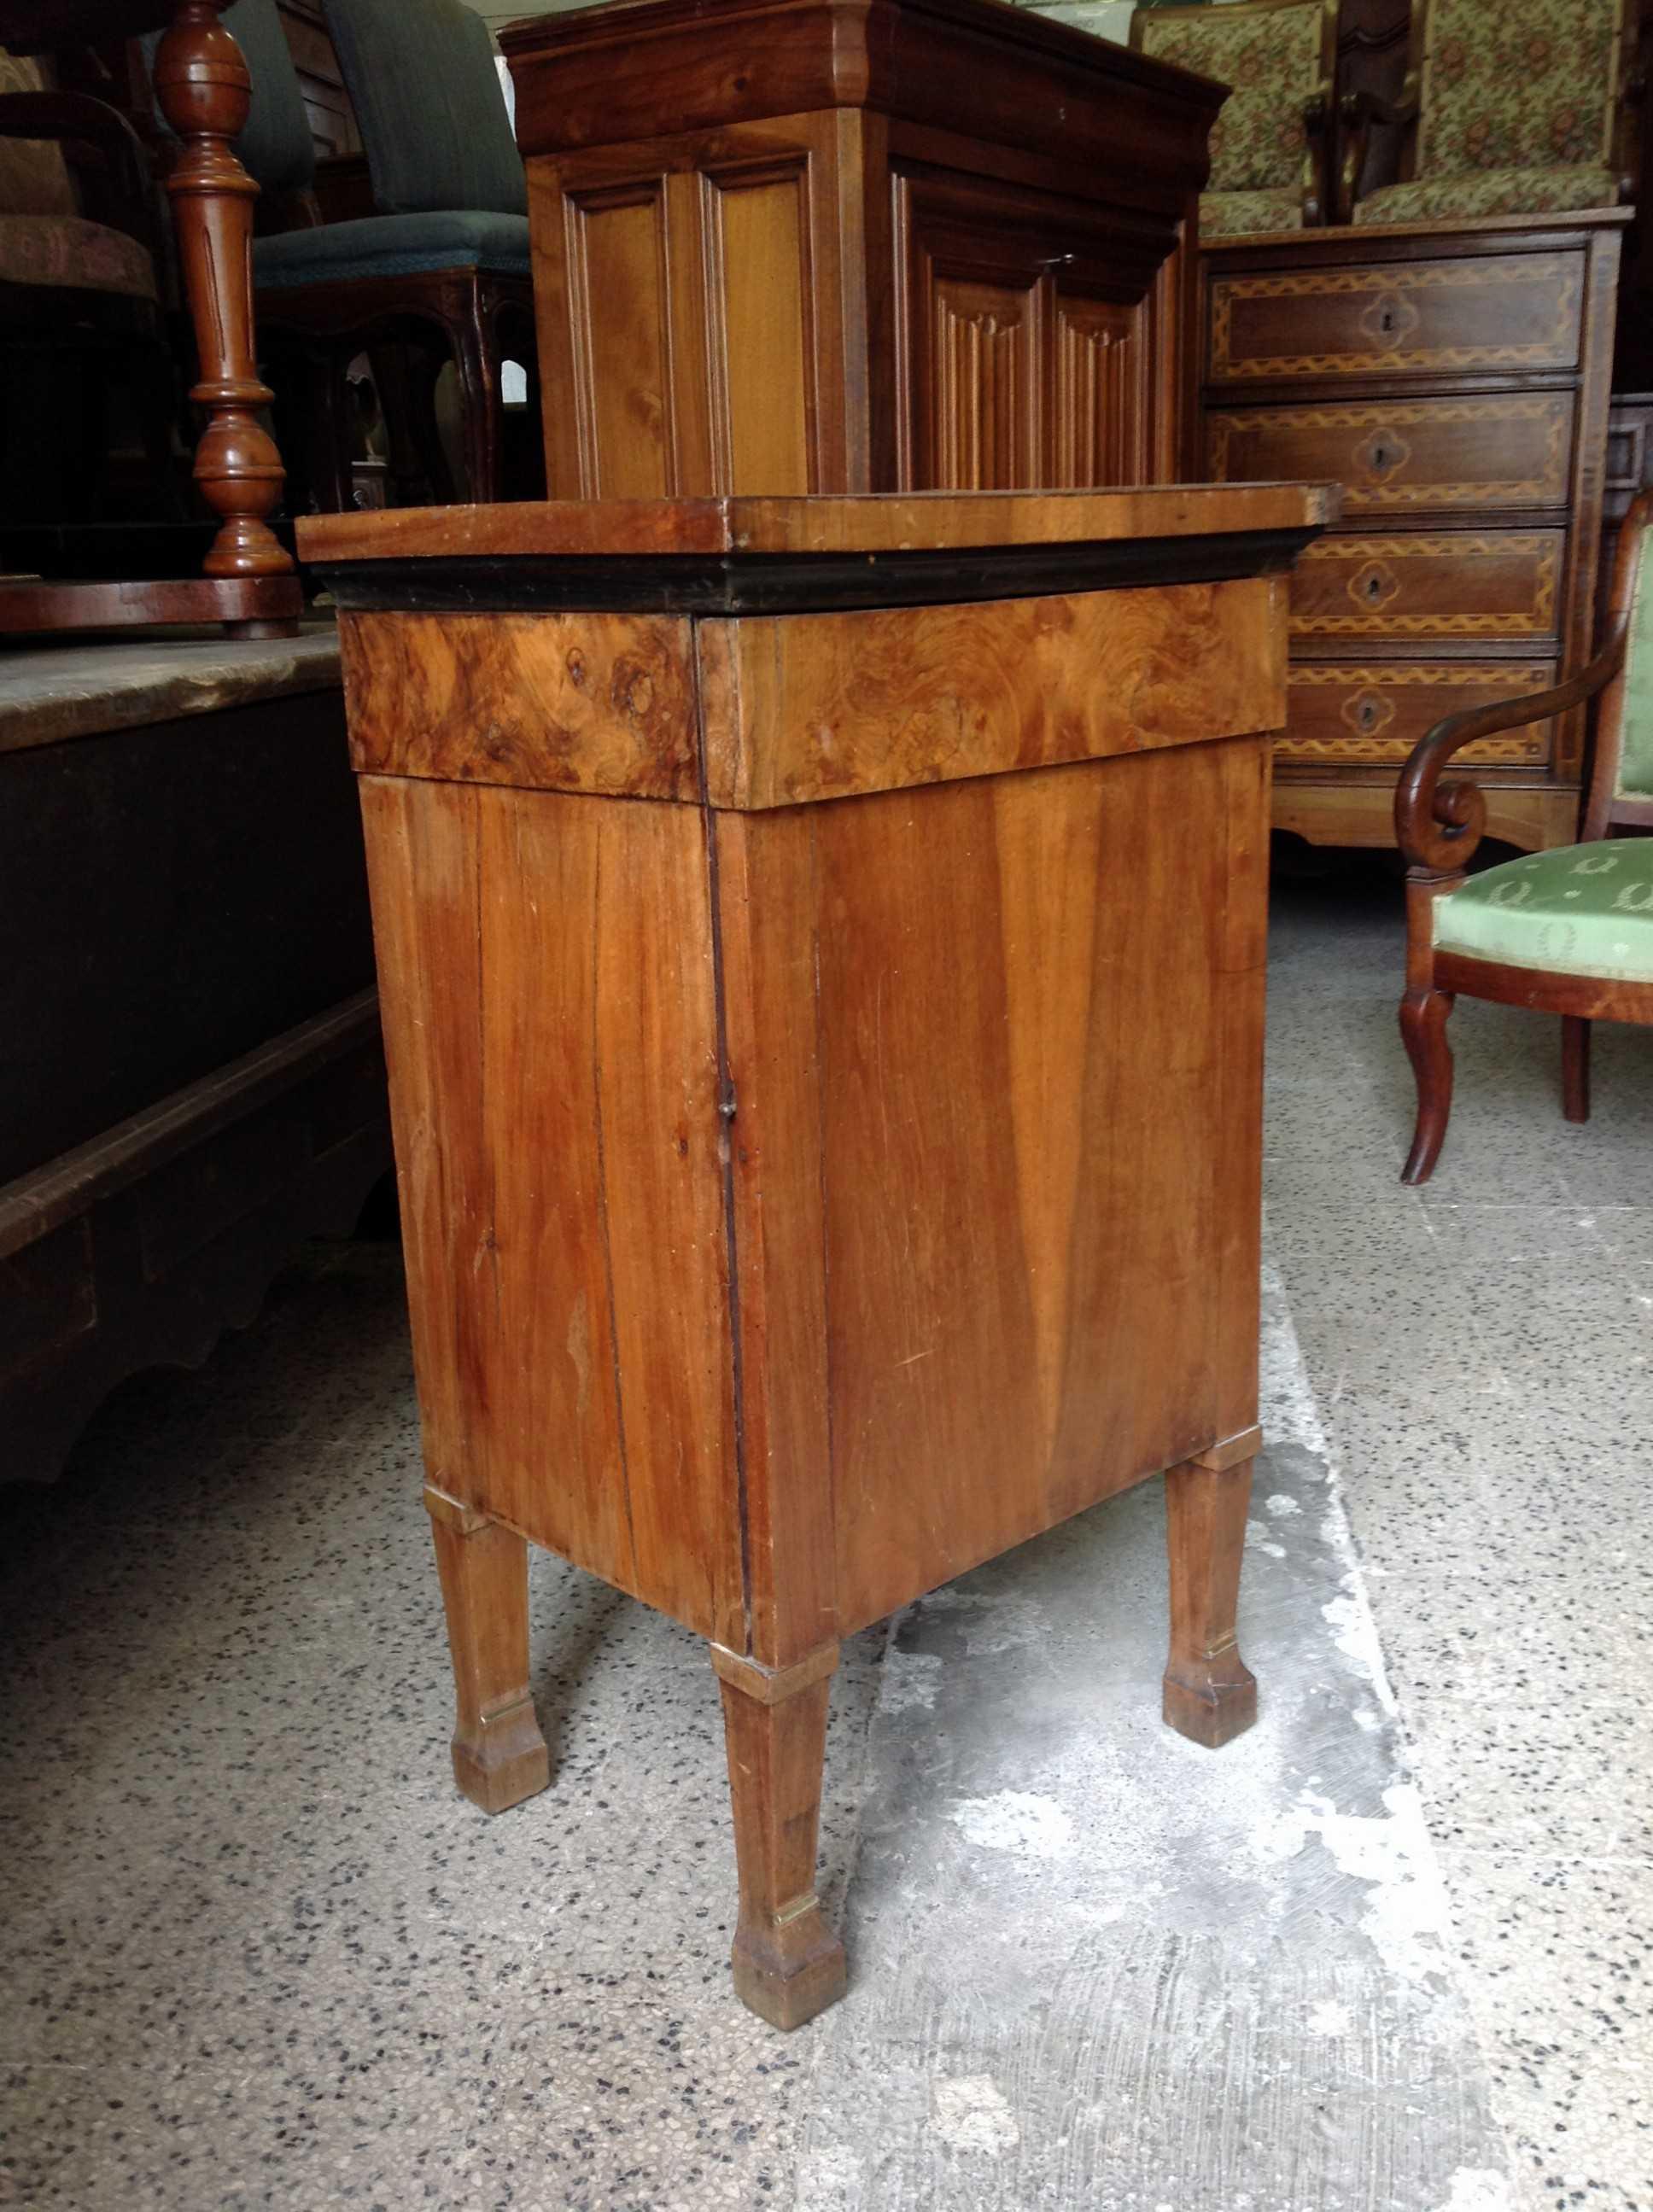 Comodino luigi xvi arredamento mobili antiquariato for Arredamento luigi xvi